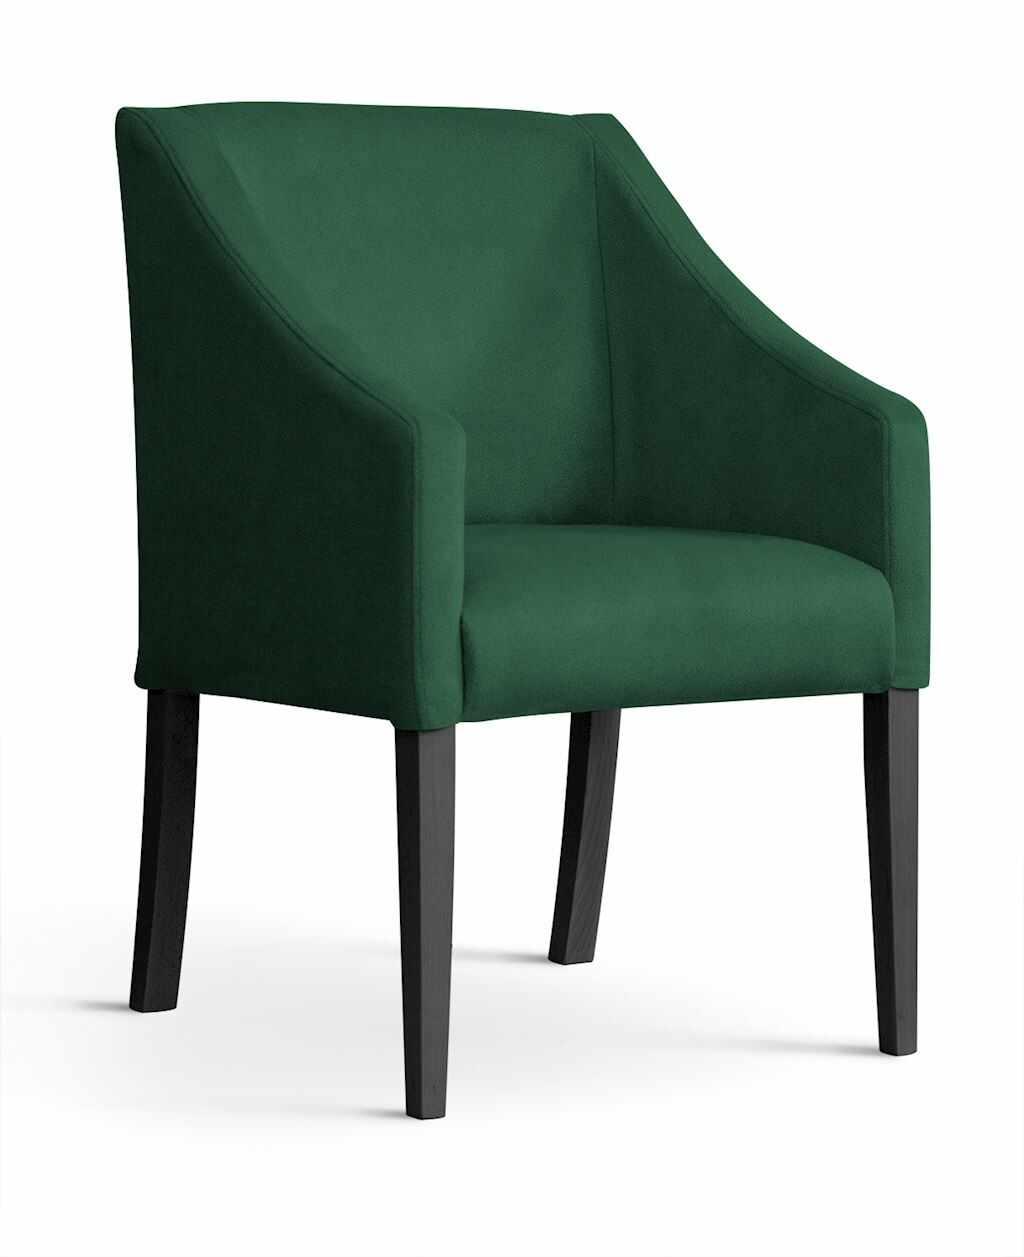 Fotoliu fix tapitat cu stofa, cu picioare din lemn Capri Green / Black, l58xA60xH89 cm la pret 686 lei